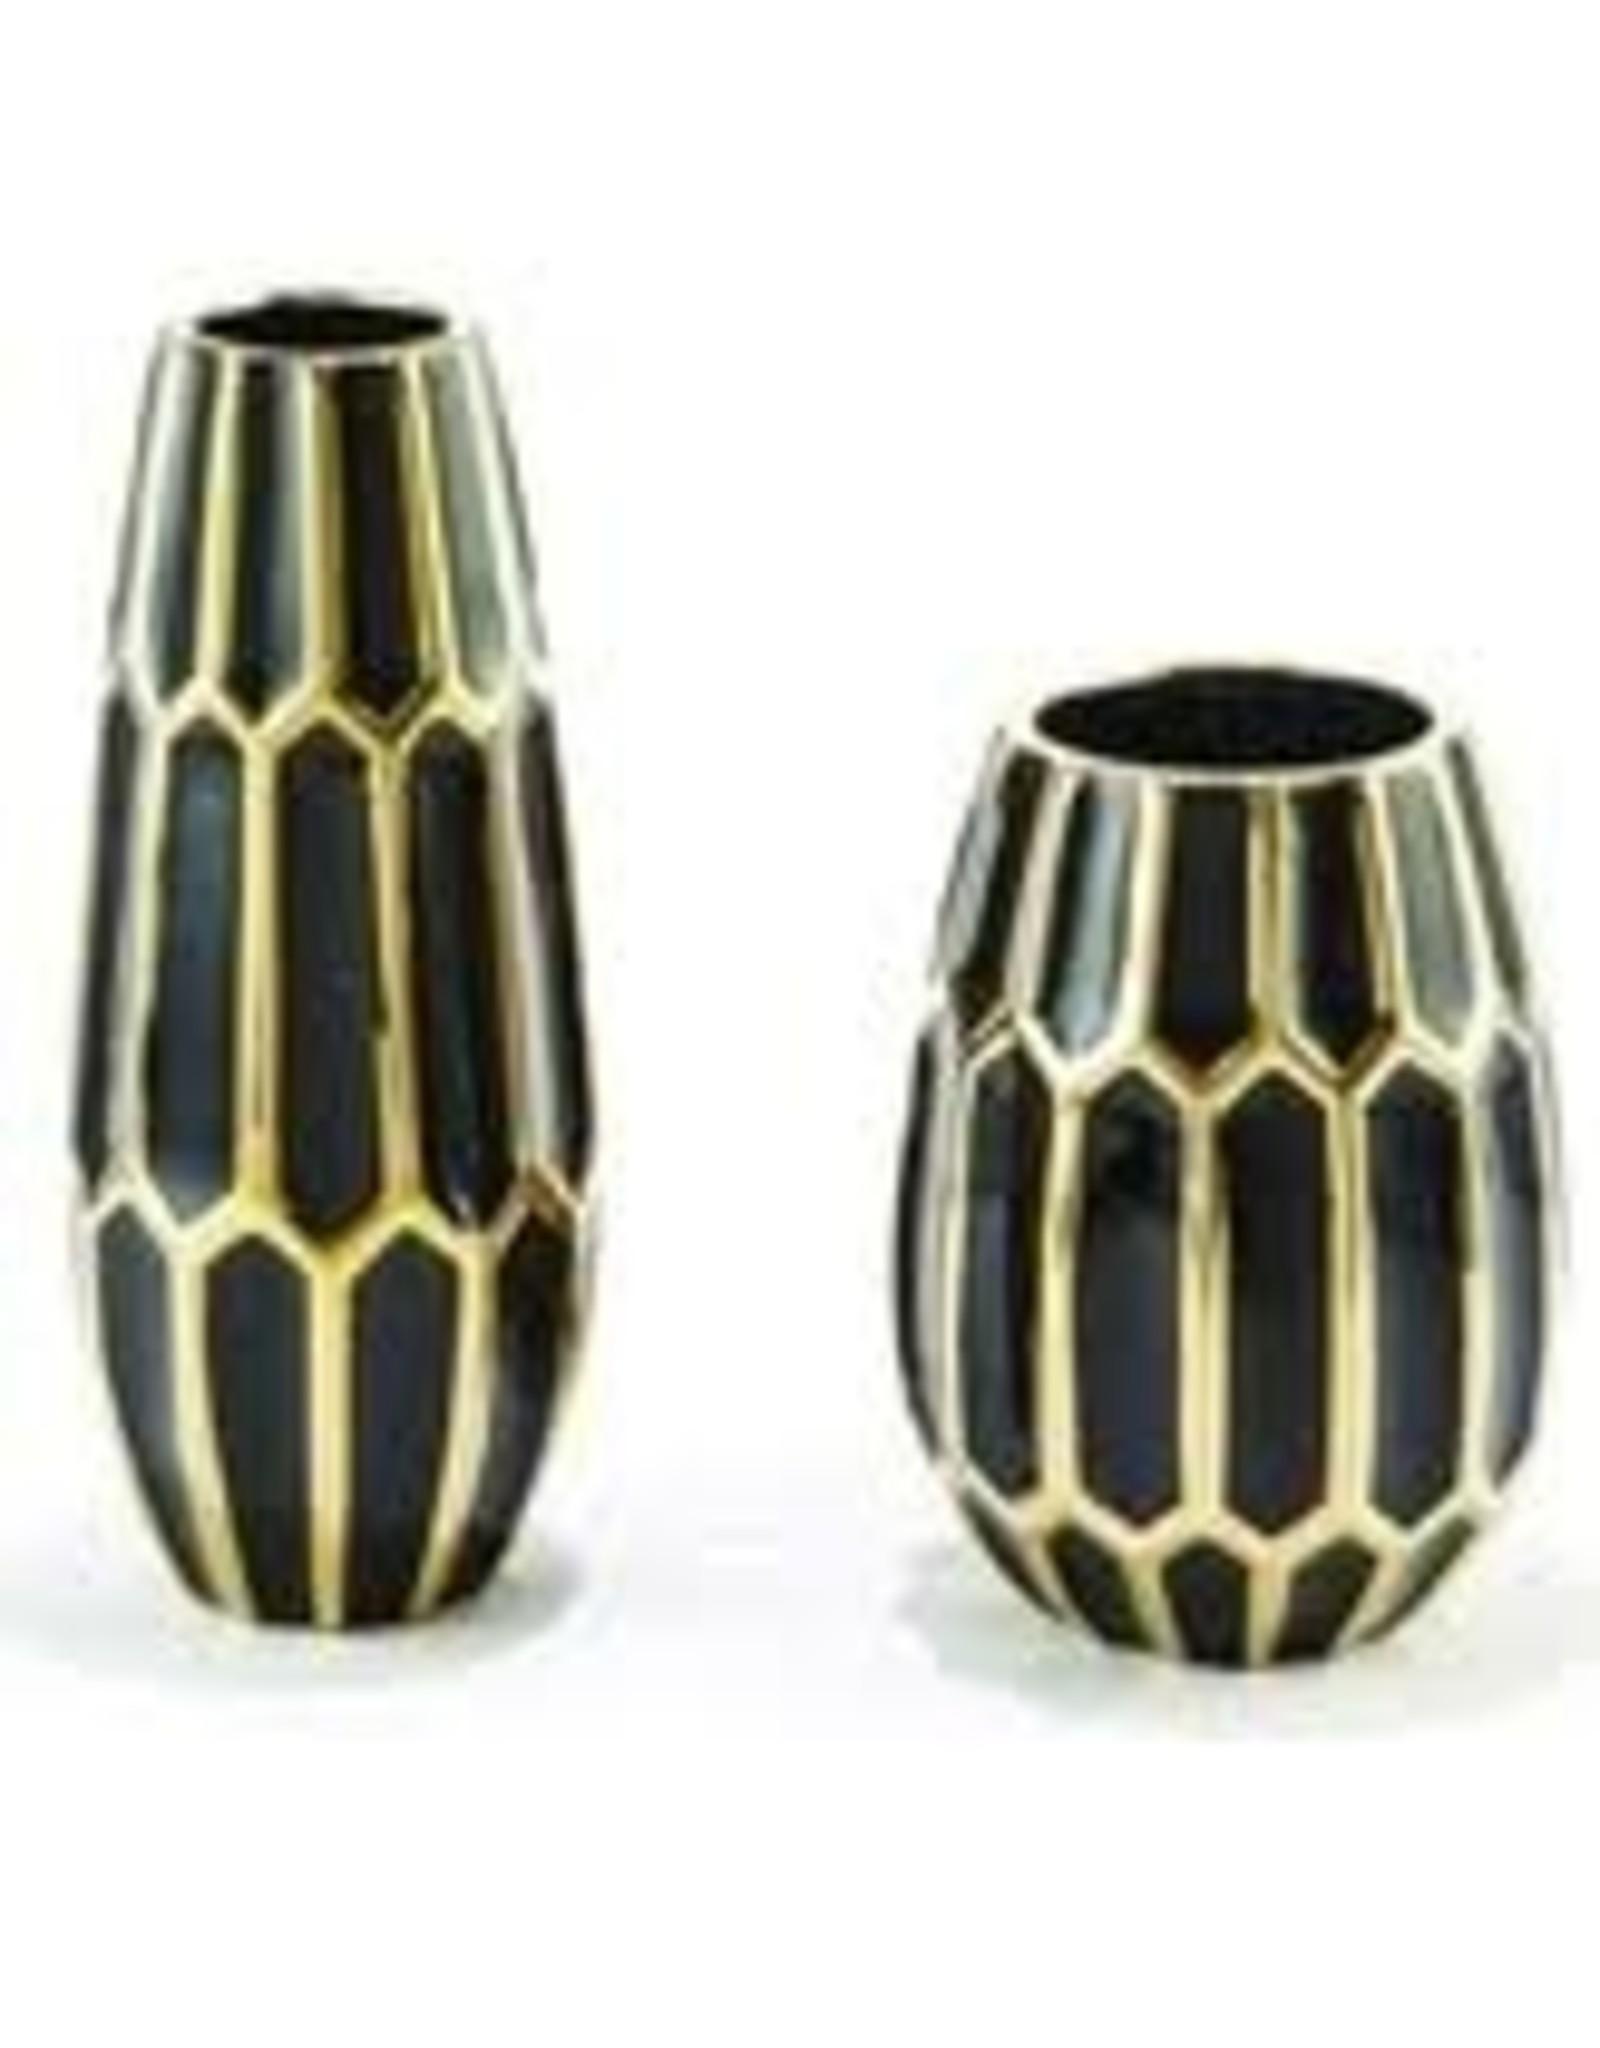 TOZAI Black and Gold Ceramic Vases- Small